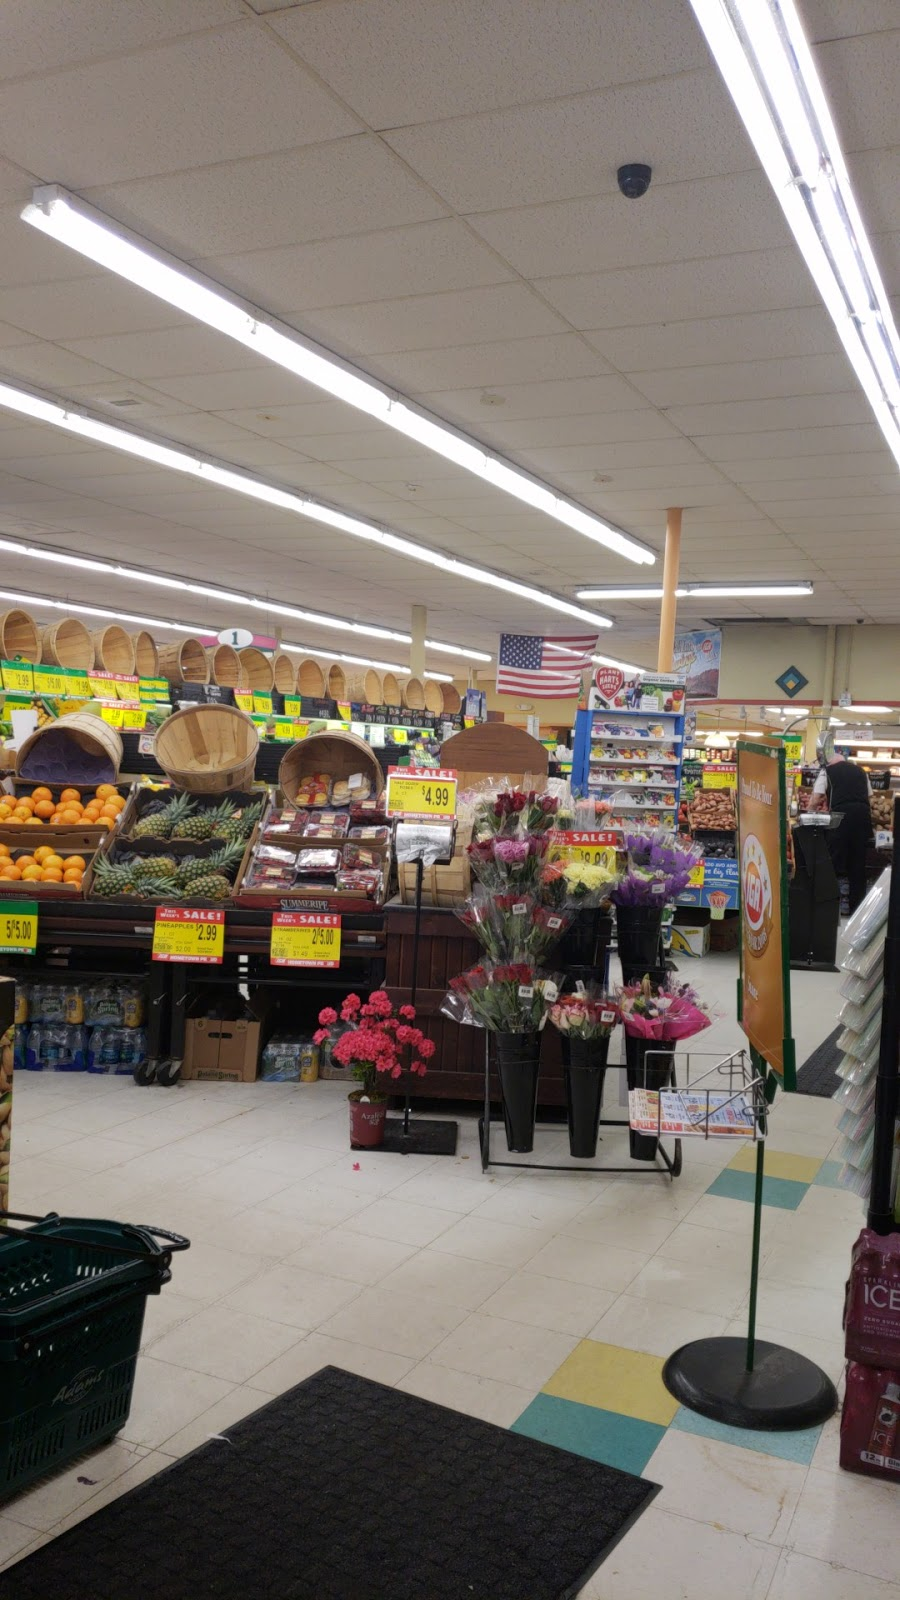 Adams Hometown Market - store  | Photo 2 of 7 | Address: 311 Main St, Terryville, CT 06786, USA | Phone: (860) 583-9177